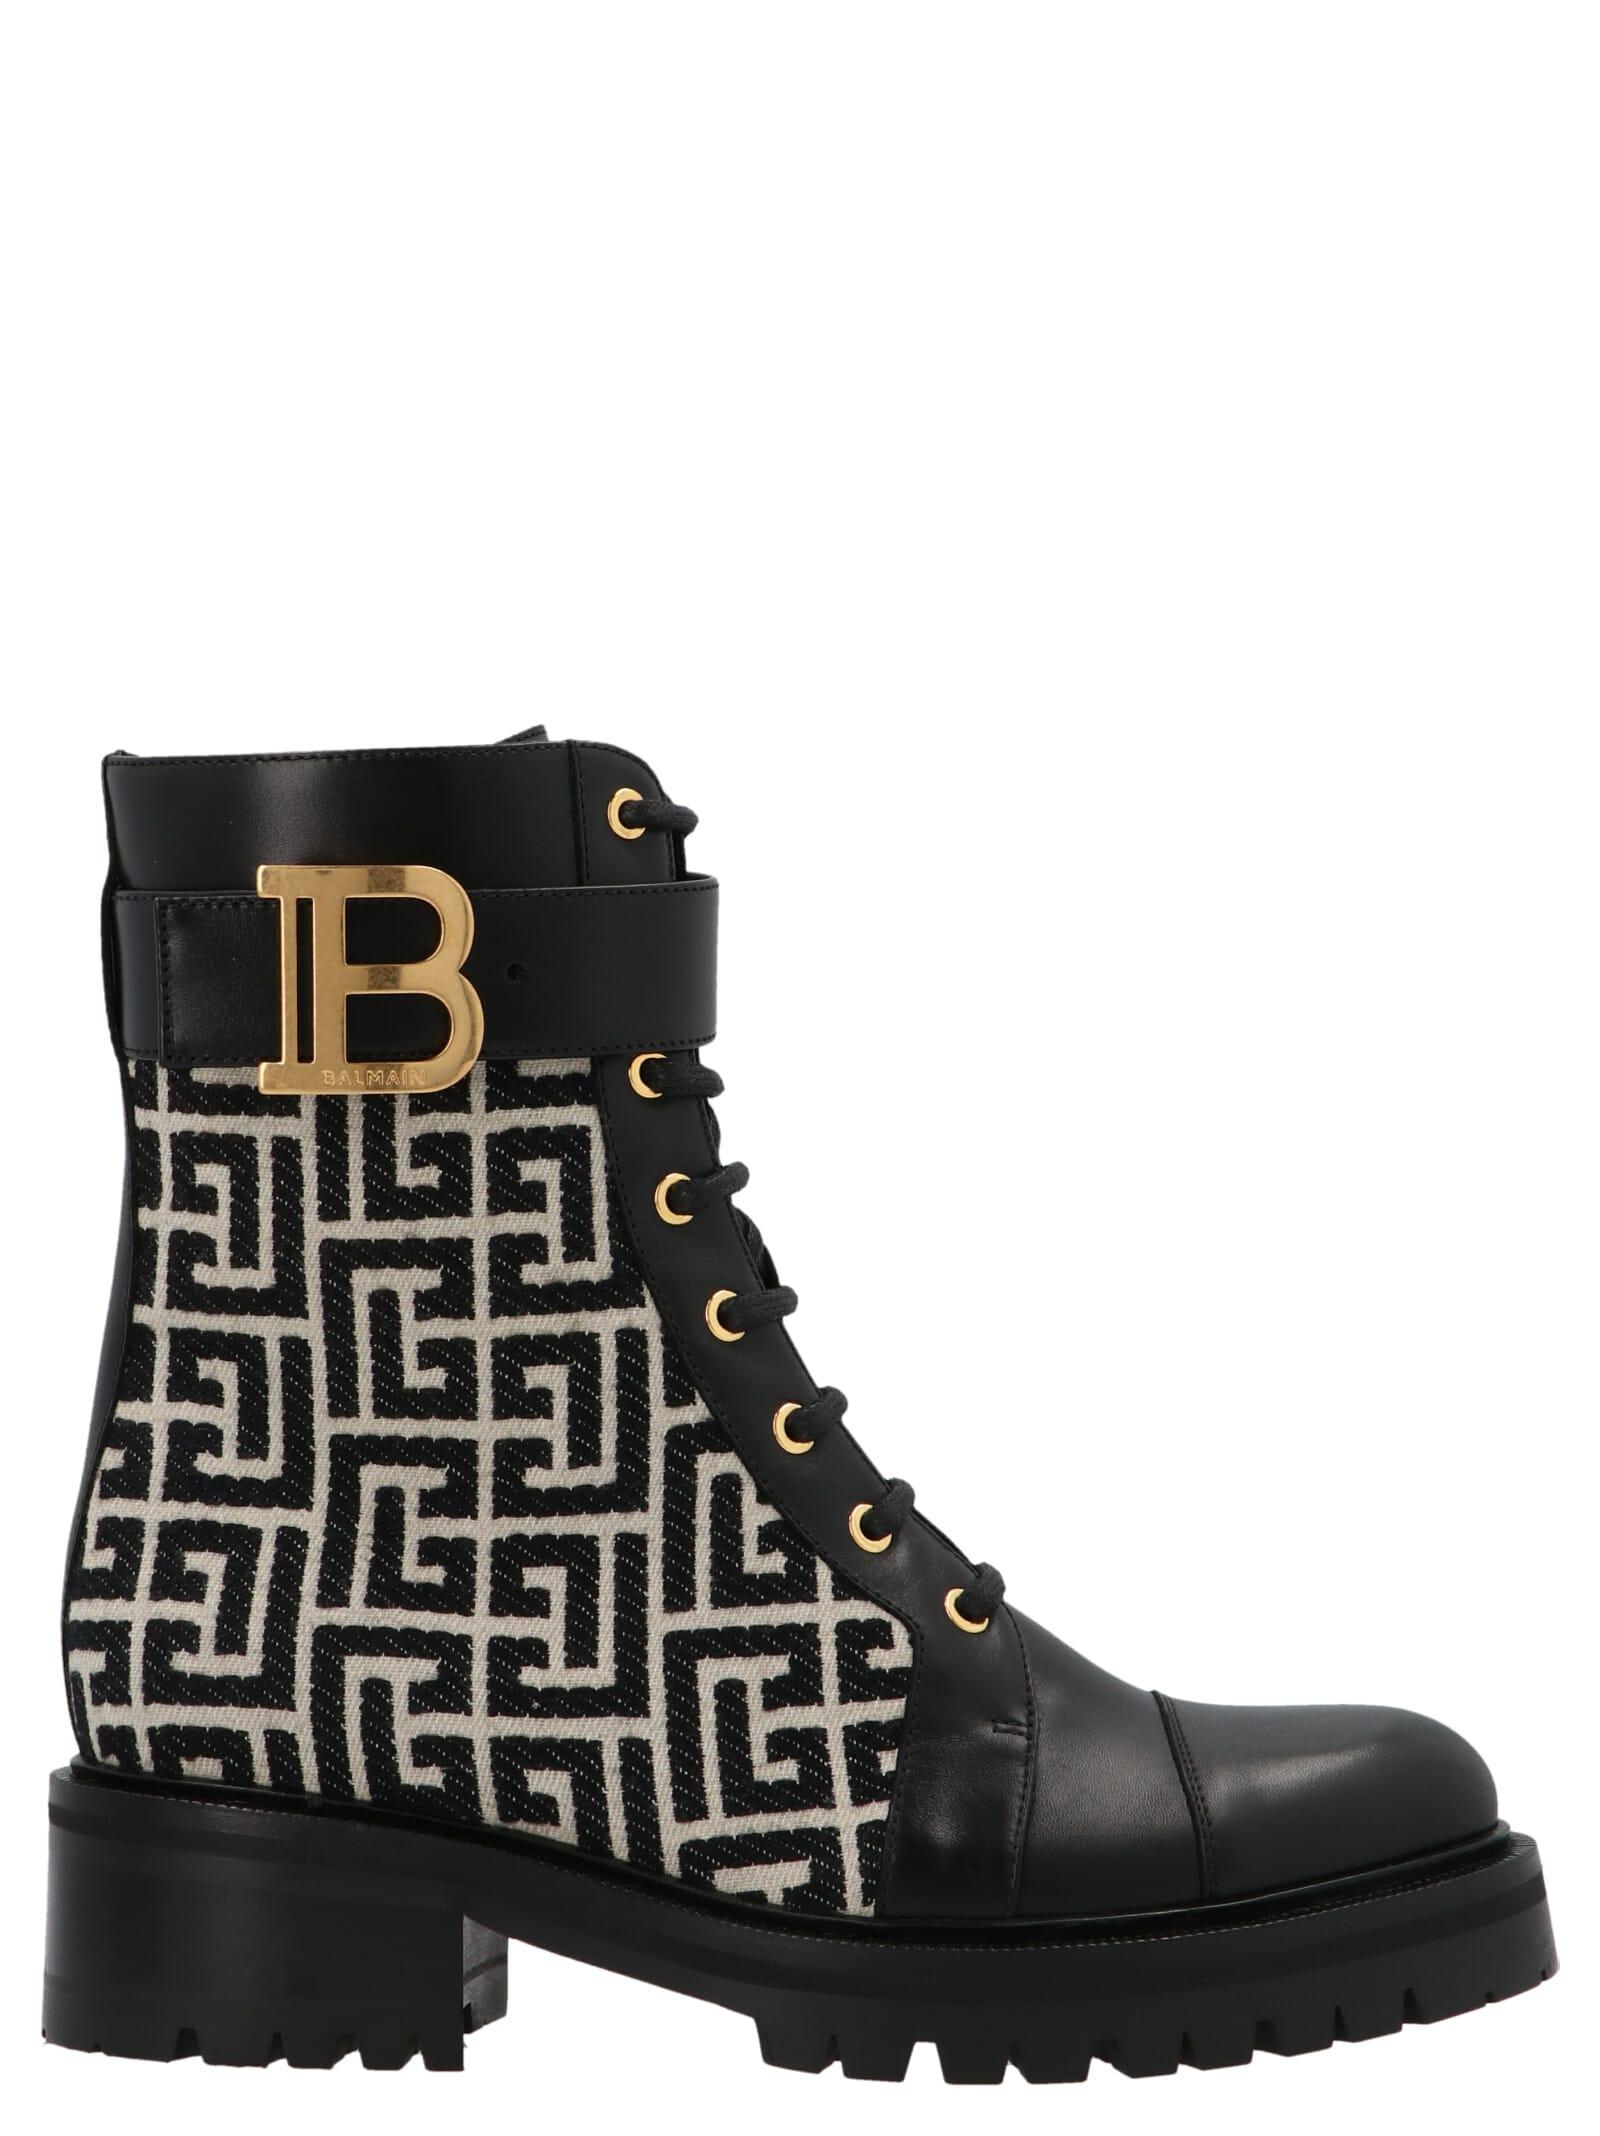 Balmain ranger Boot Shoes